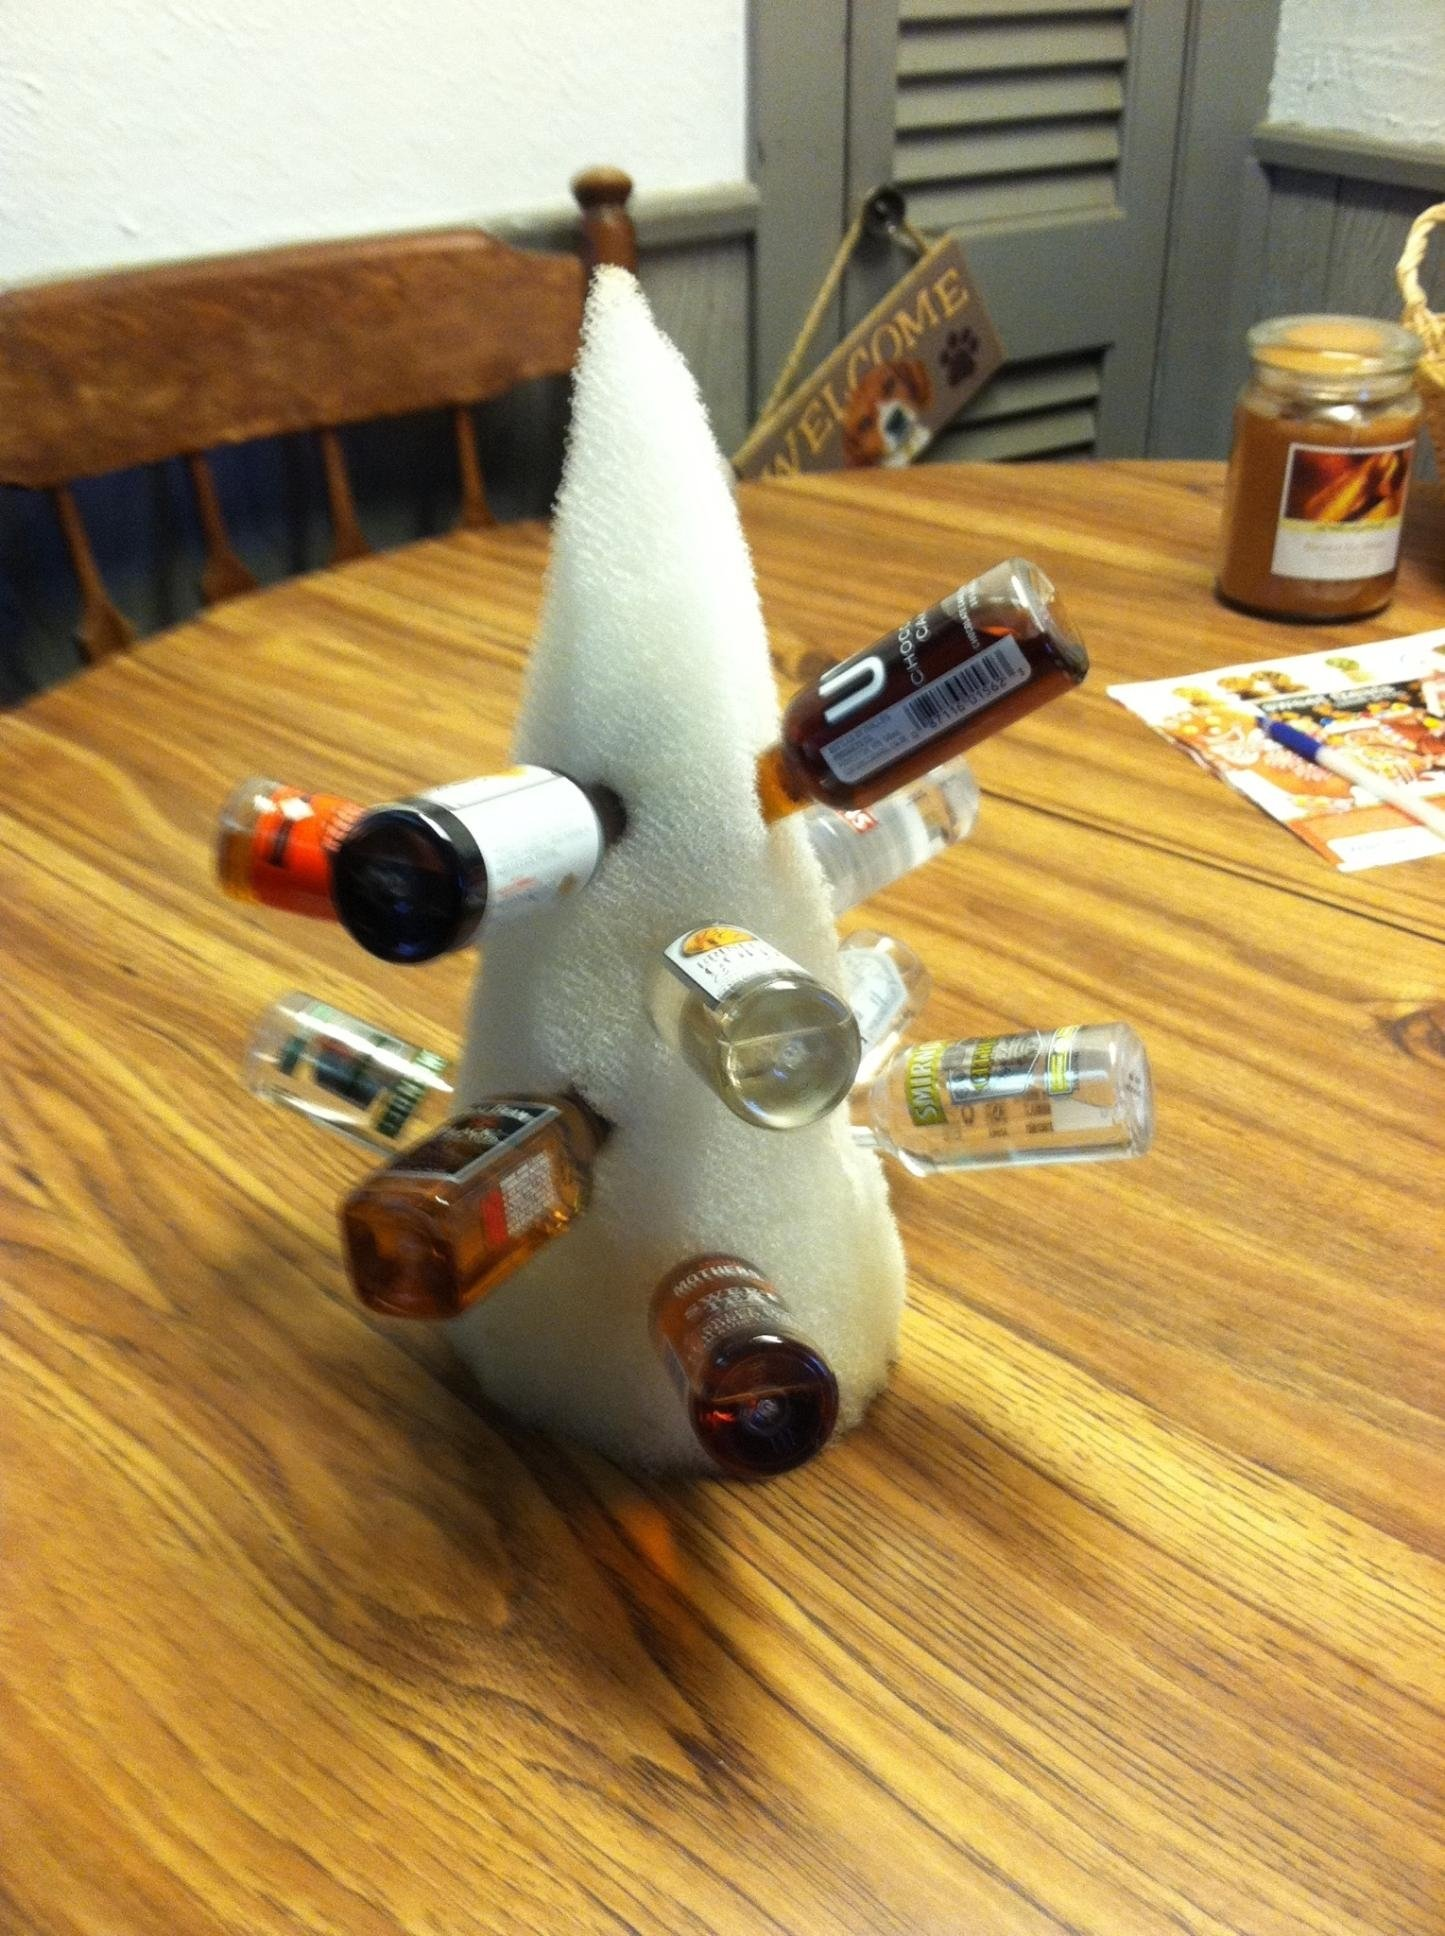 10 Attractive Office Yankee Swap Gift Ideas 10 yankee swap 12 nips on a foam tree best grab gift favorite